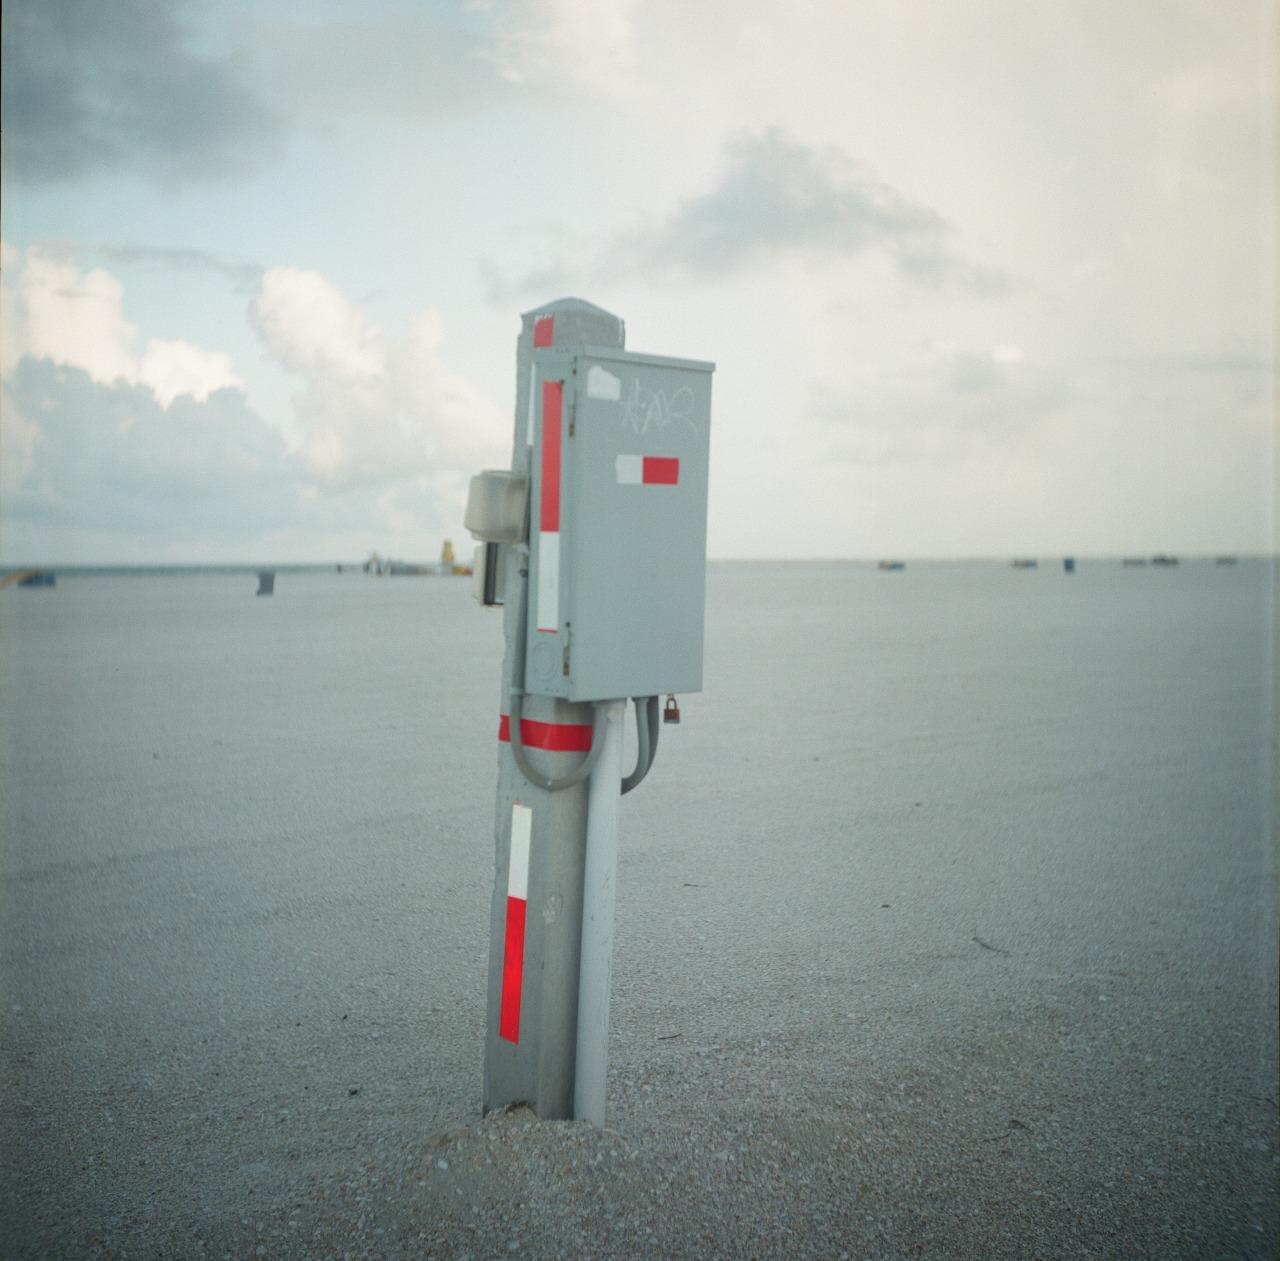 Treasure Island, St. Petersburg, FL. July, 2014